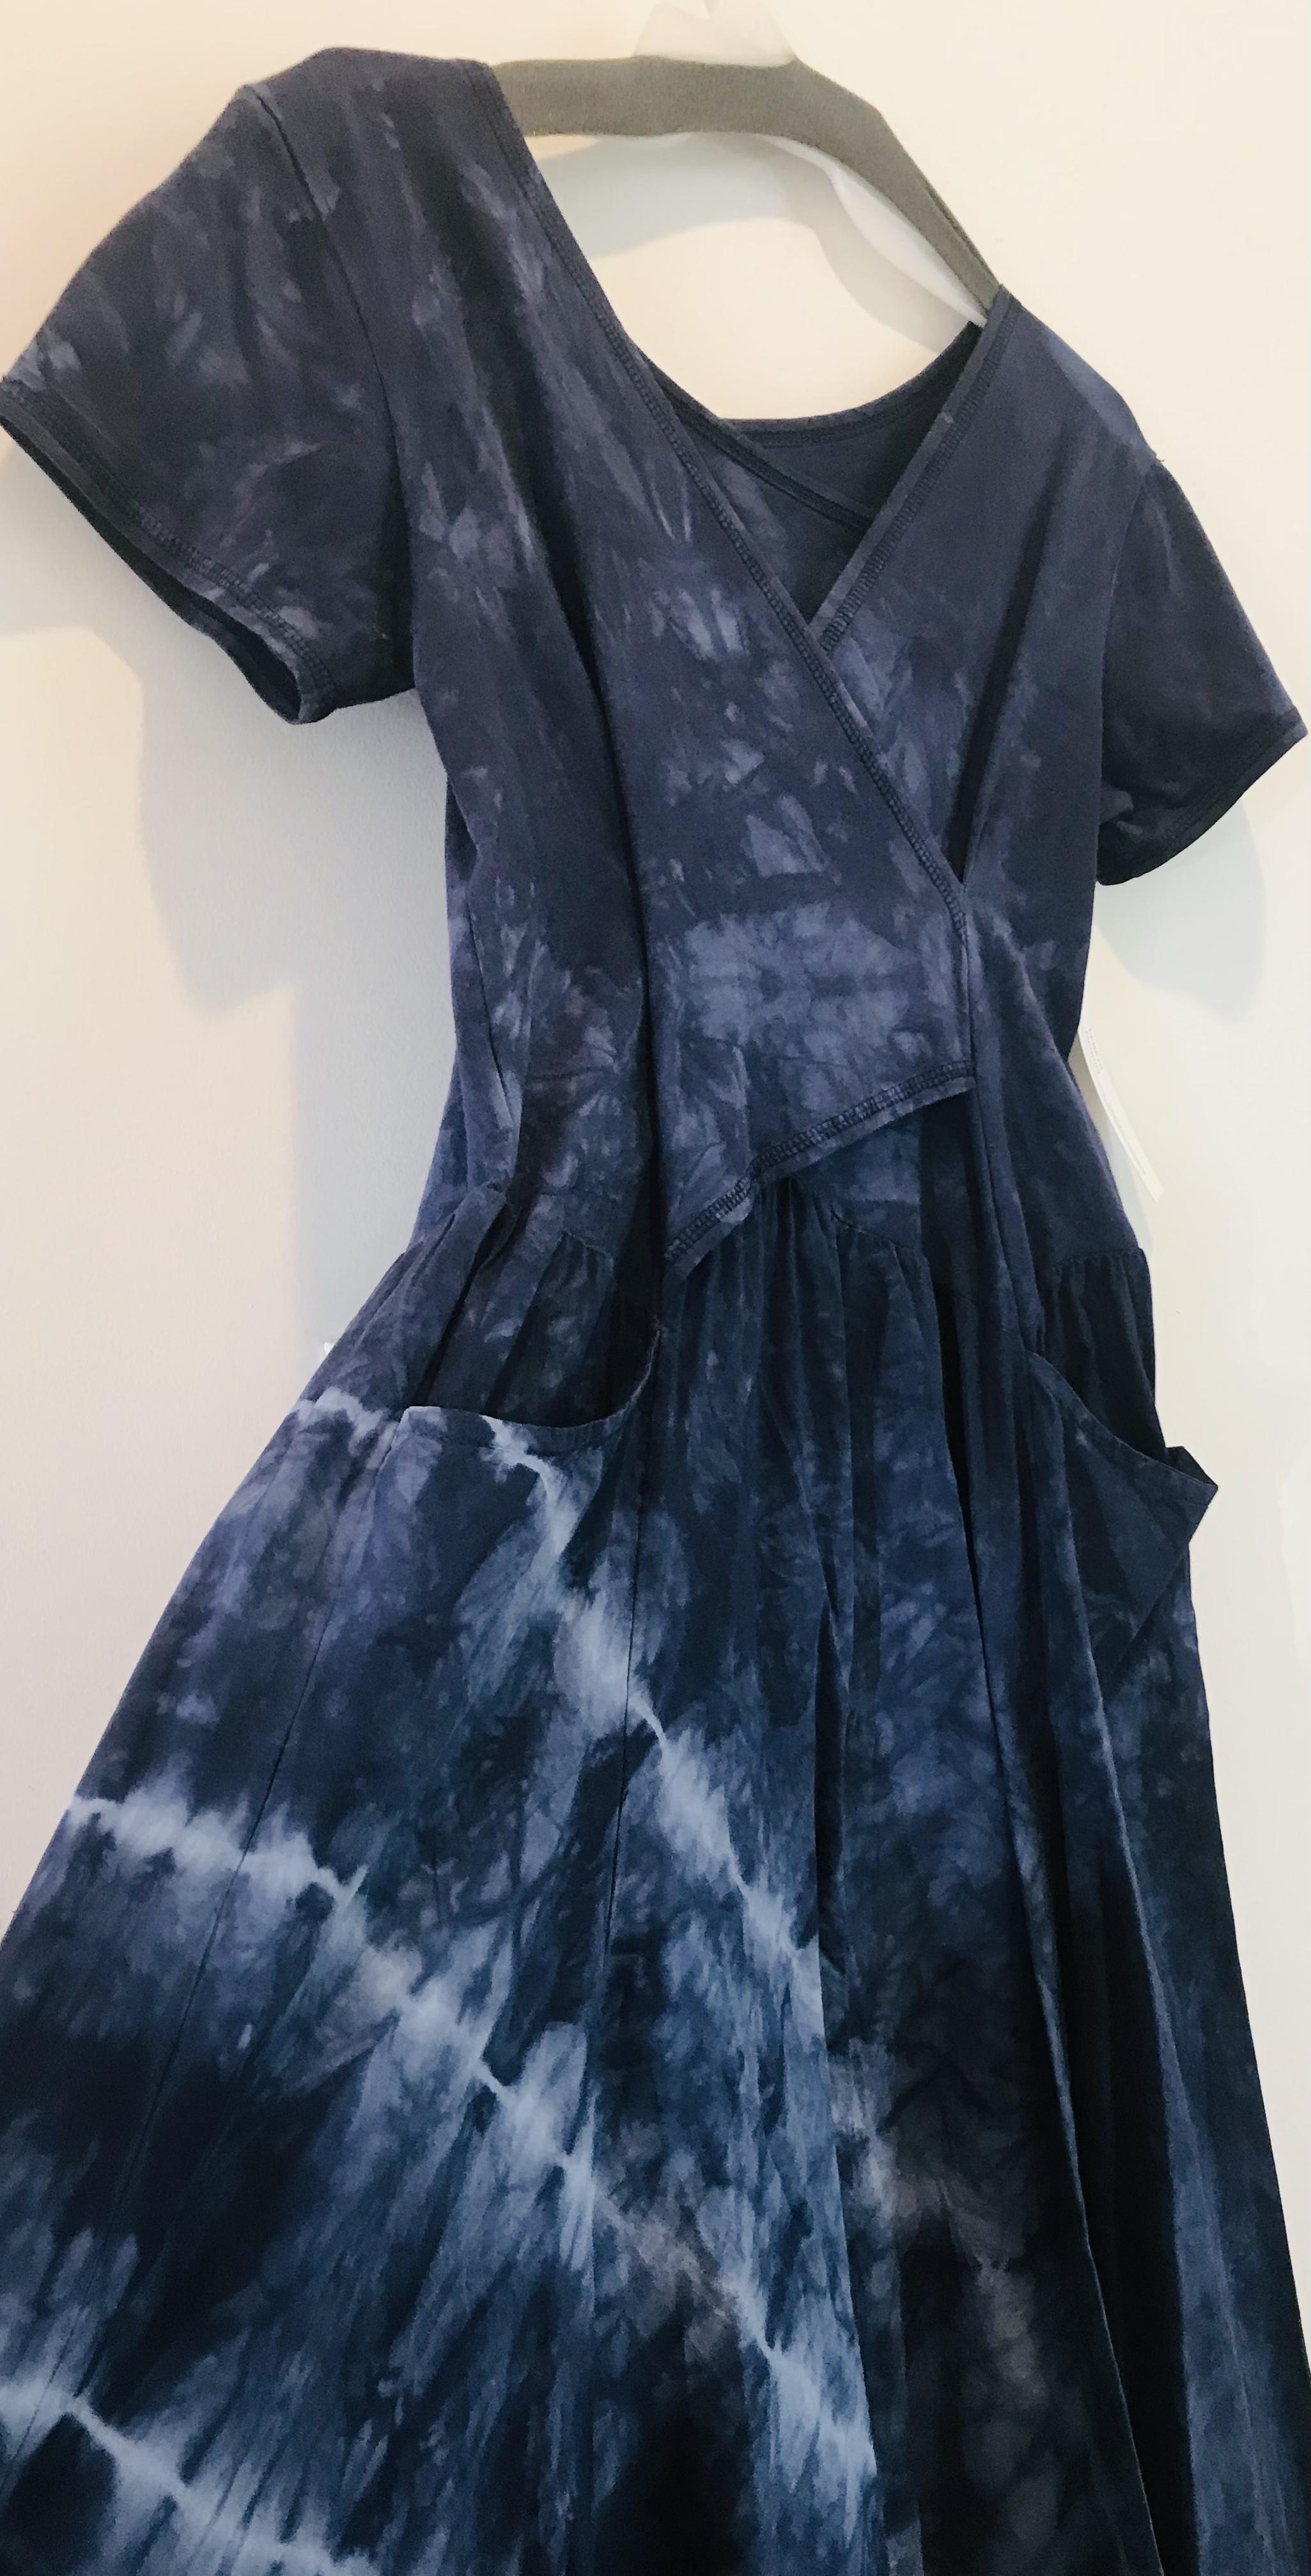 Luna Luz: Short Sleeve Cross Over Bodice Tie Dye Long Dress (Ships Immed: Navy Shoreline, 1 Left!) LL_518_NAVYSHORELINE_NEW1